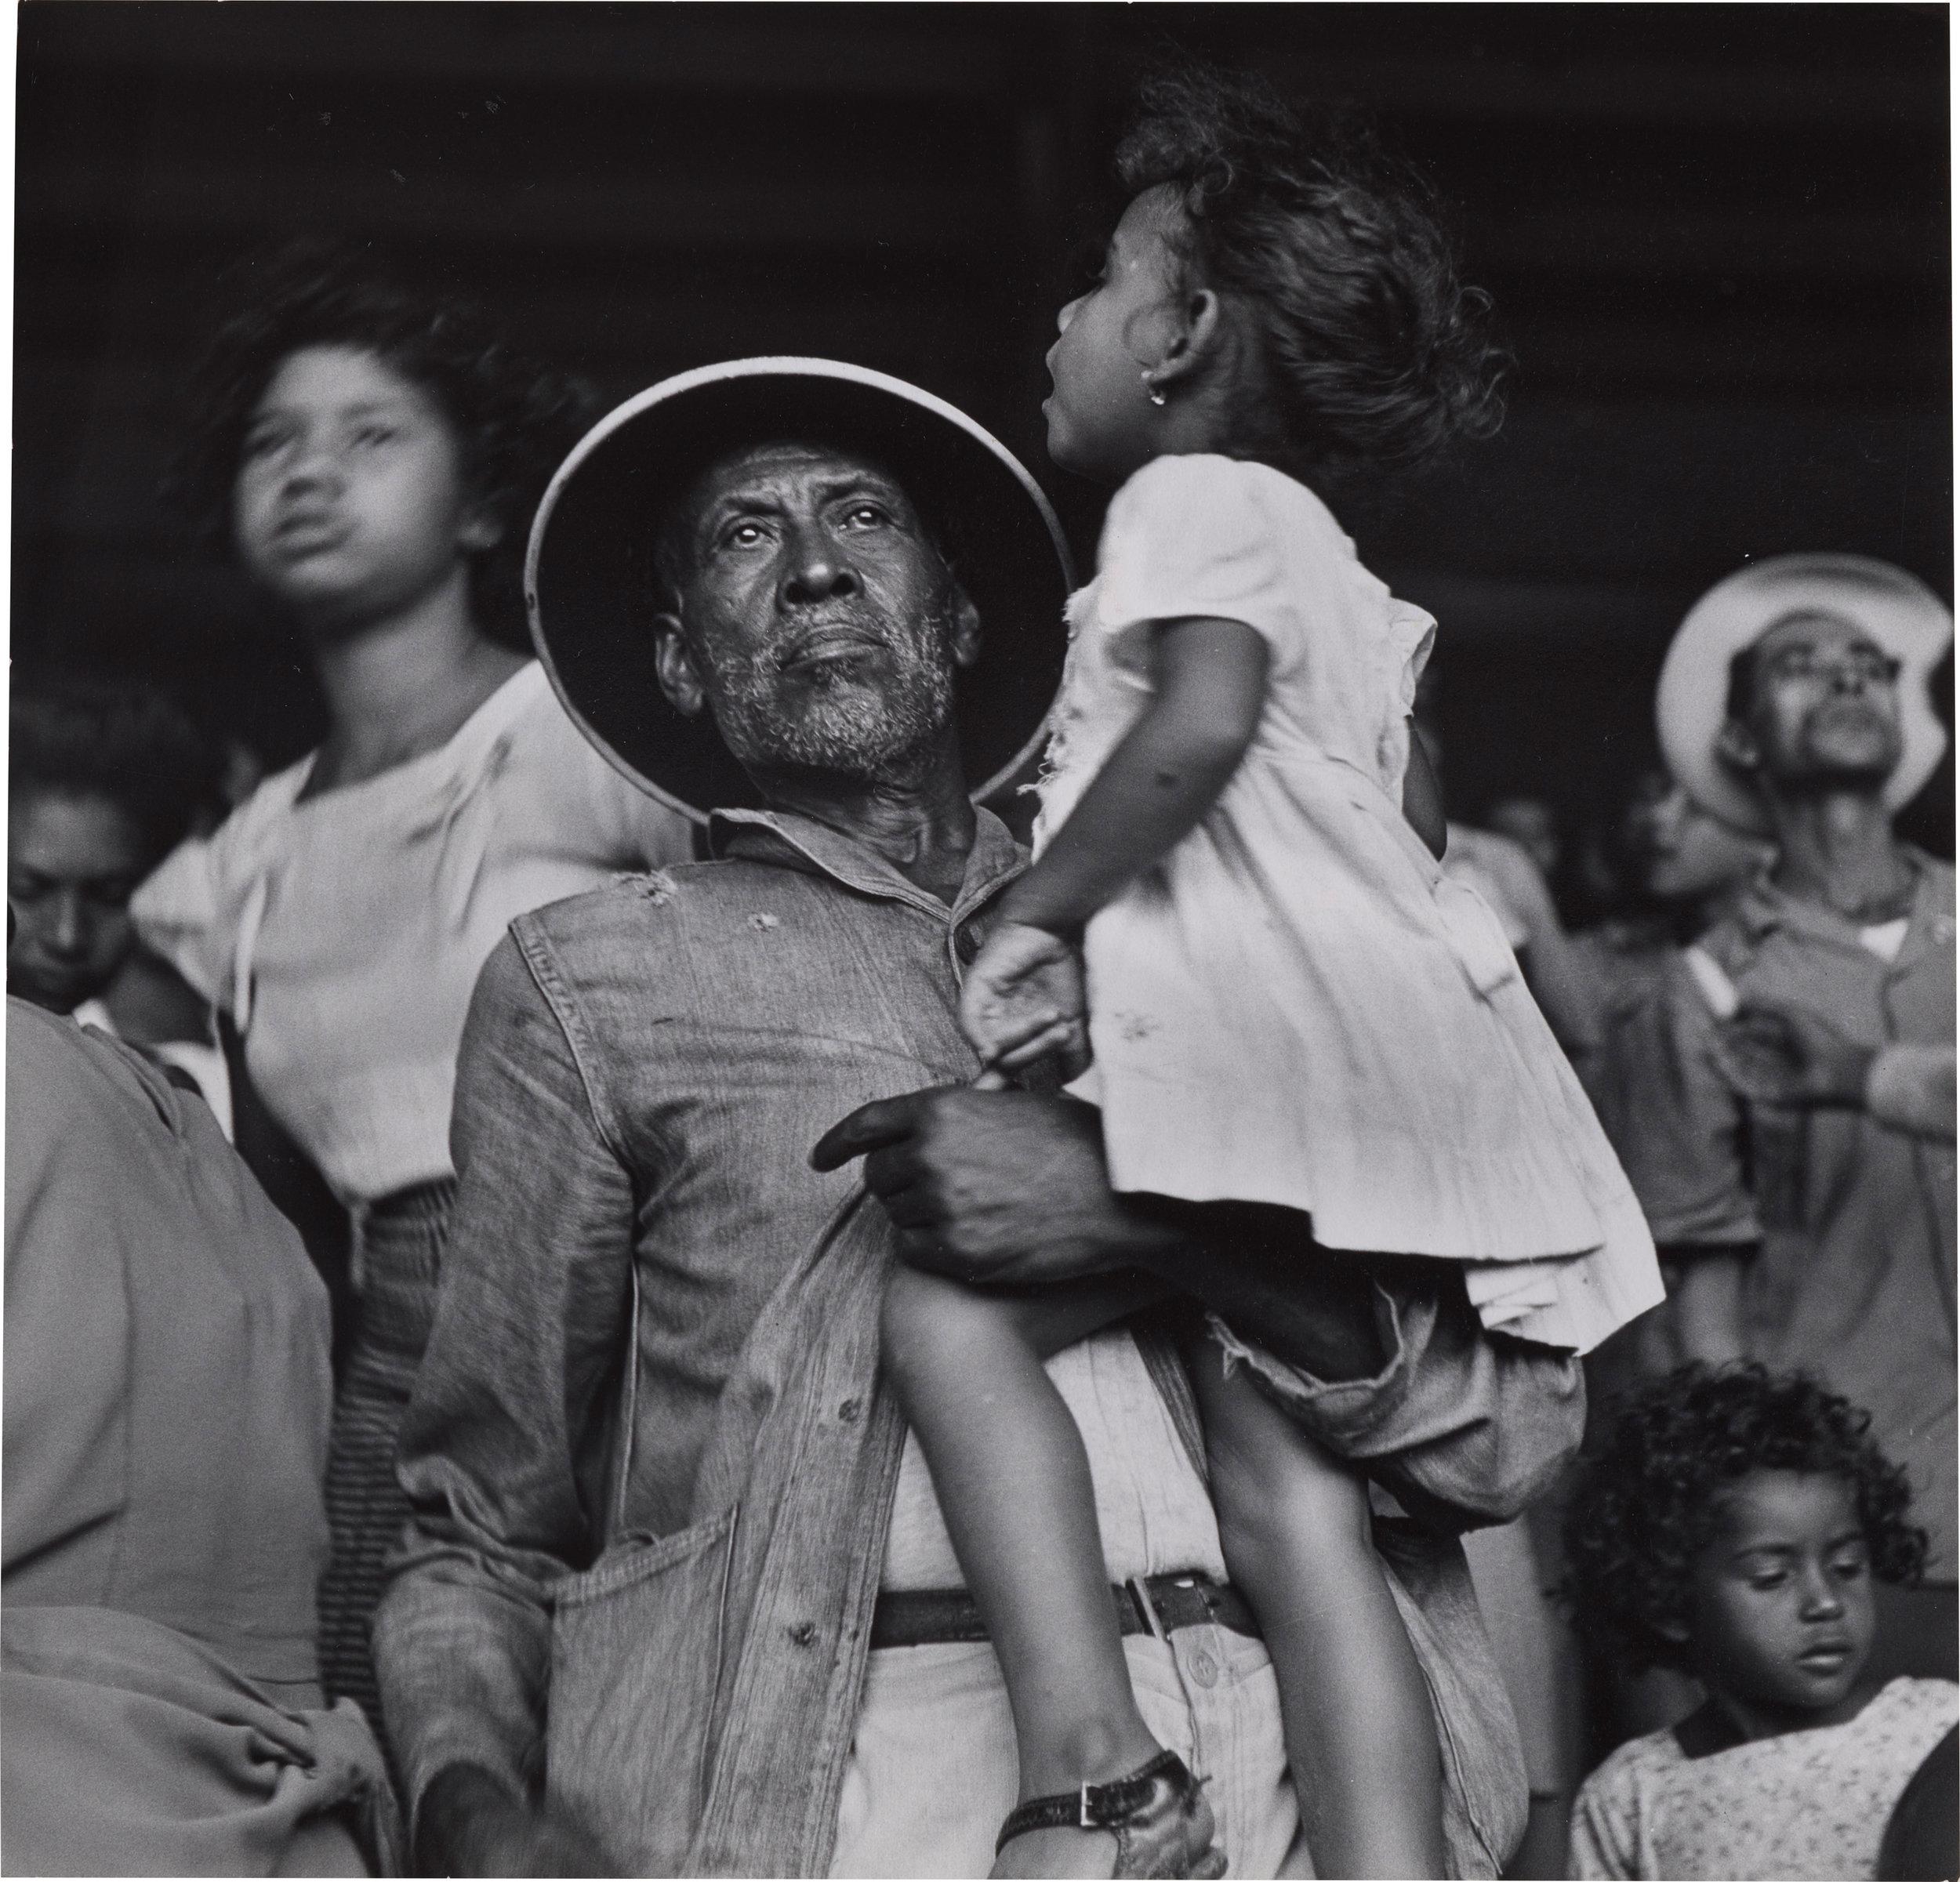 Untitled, Puerto Rico. 1949 © Gordon Parks